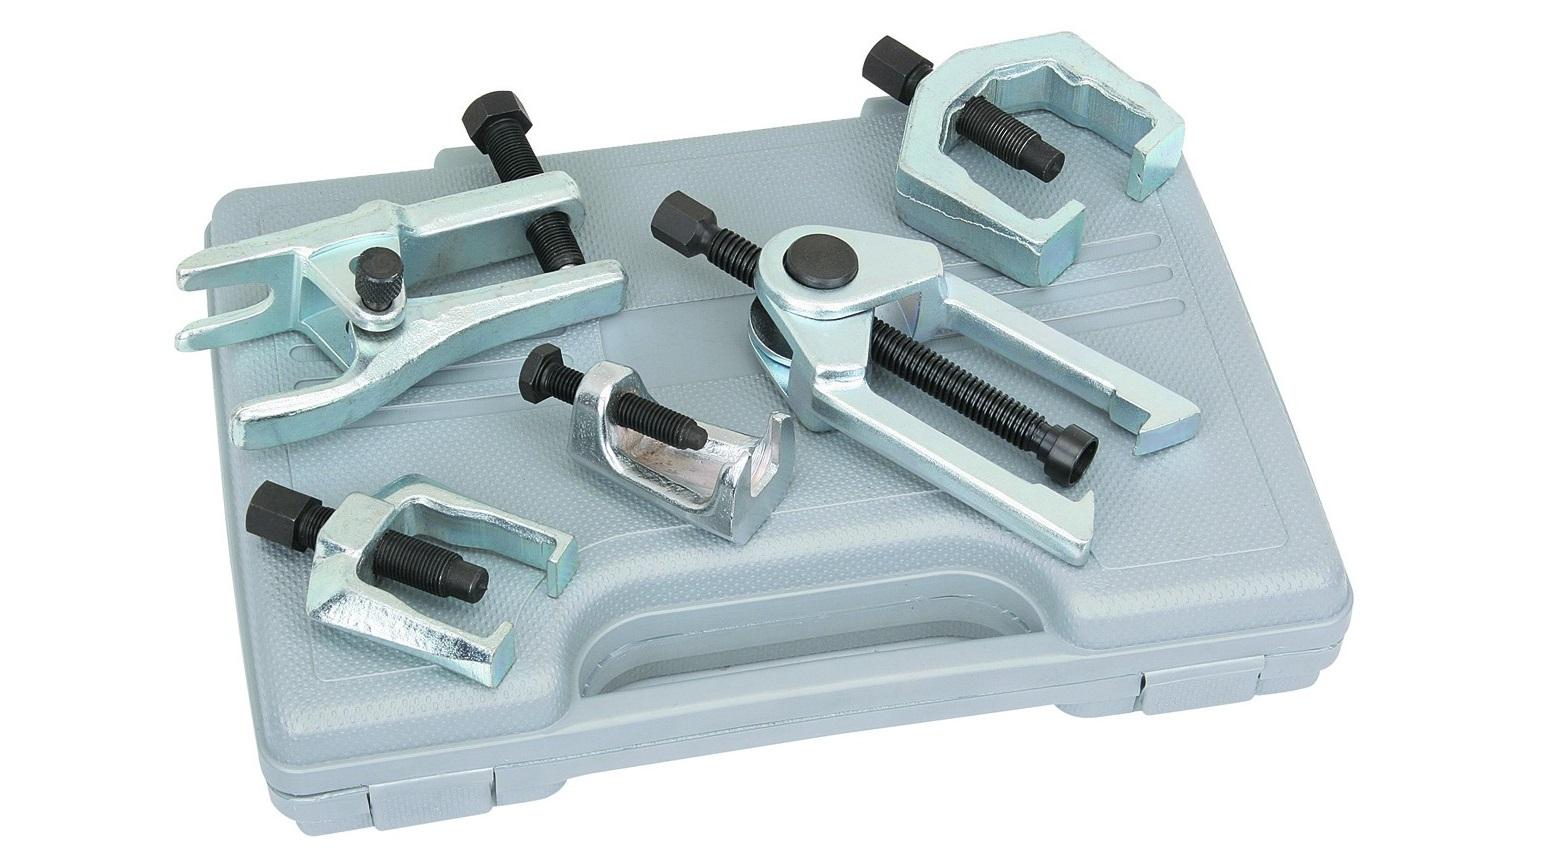 Pitman Arm Puller For Domestic Cars /& Light Duty Trucks NEW OTC 8150